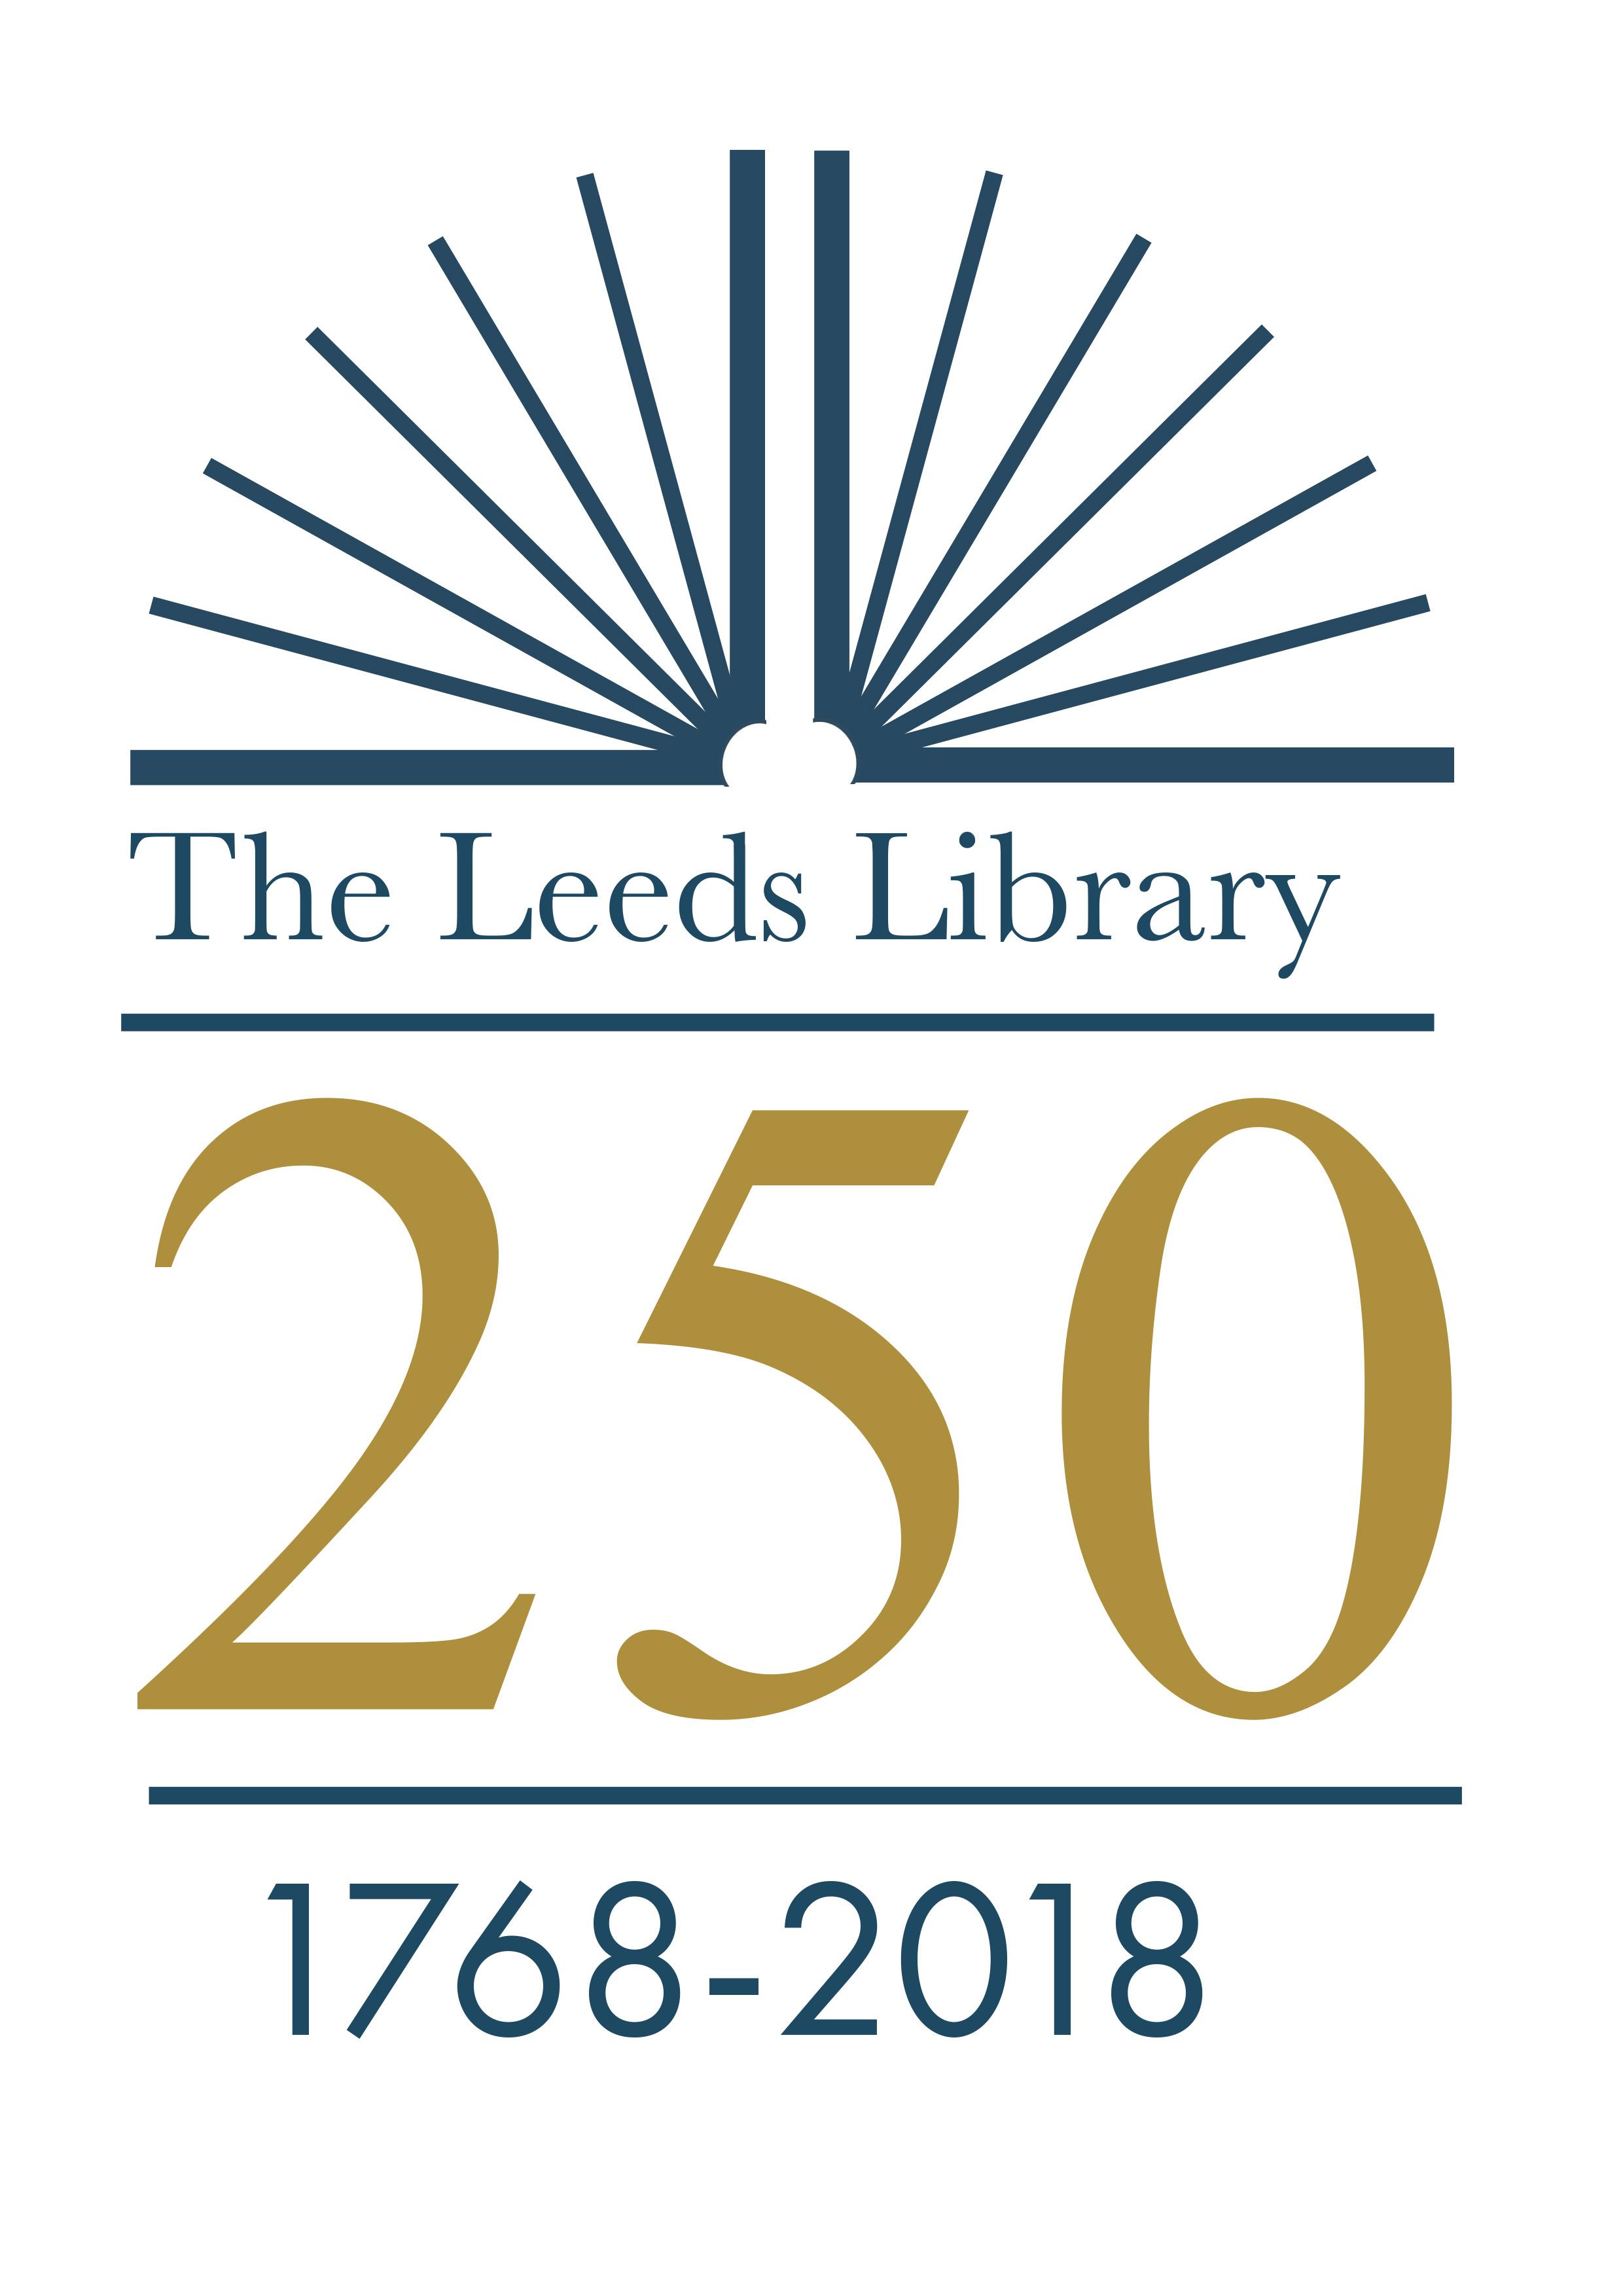 Leeds Library logo 2 of 2 .jpg